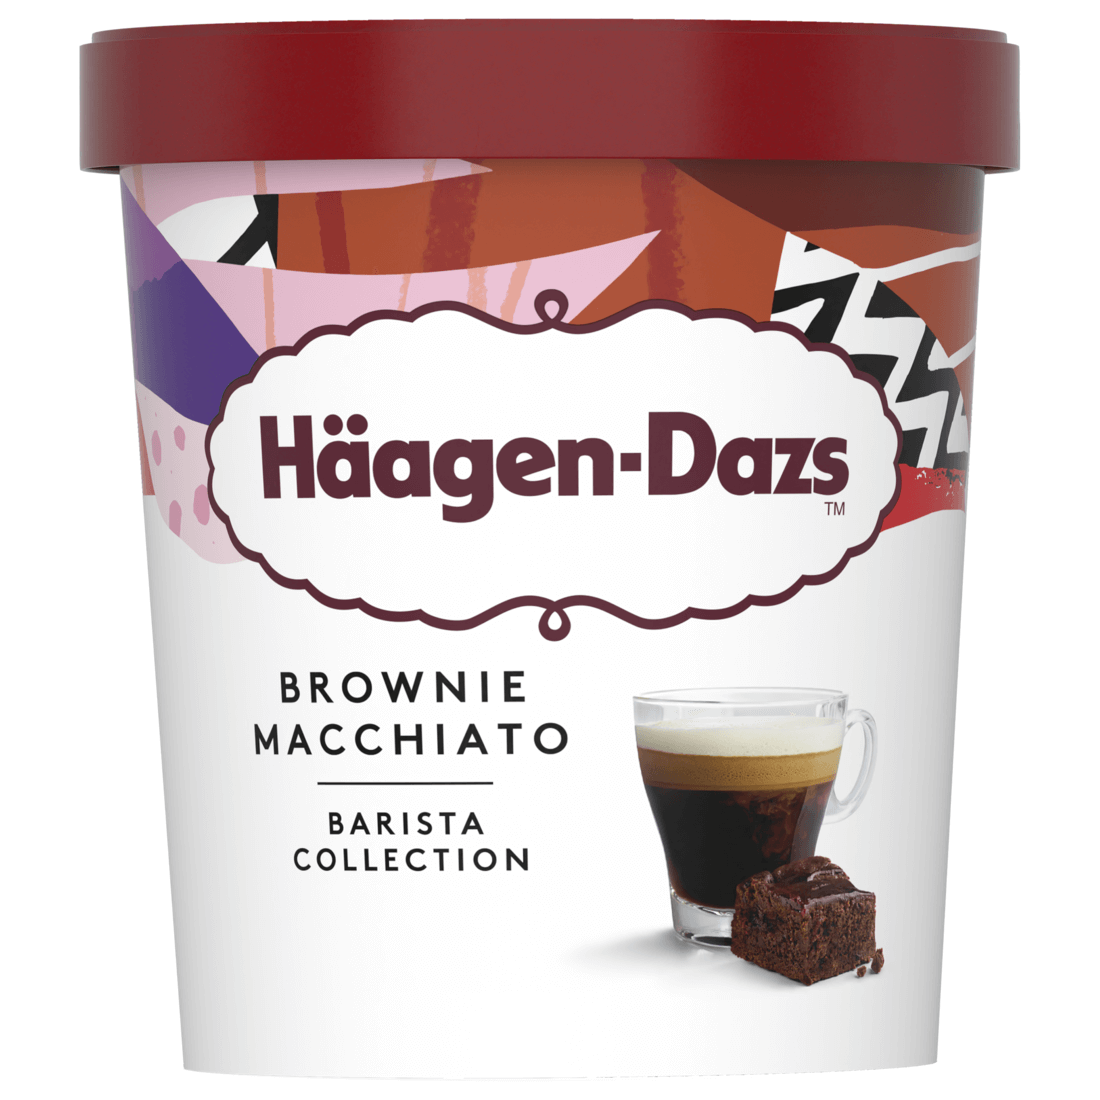 Häagen-Dazs™朱古力蛋糕咖啡雪糕 HK$30